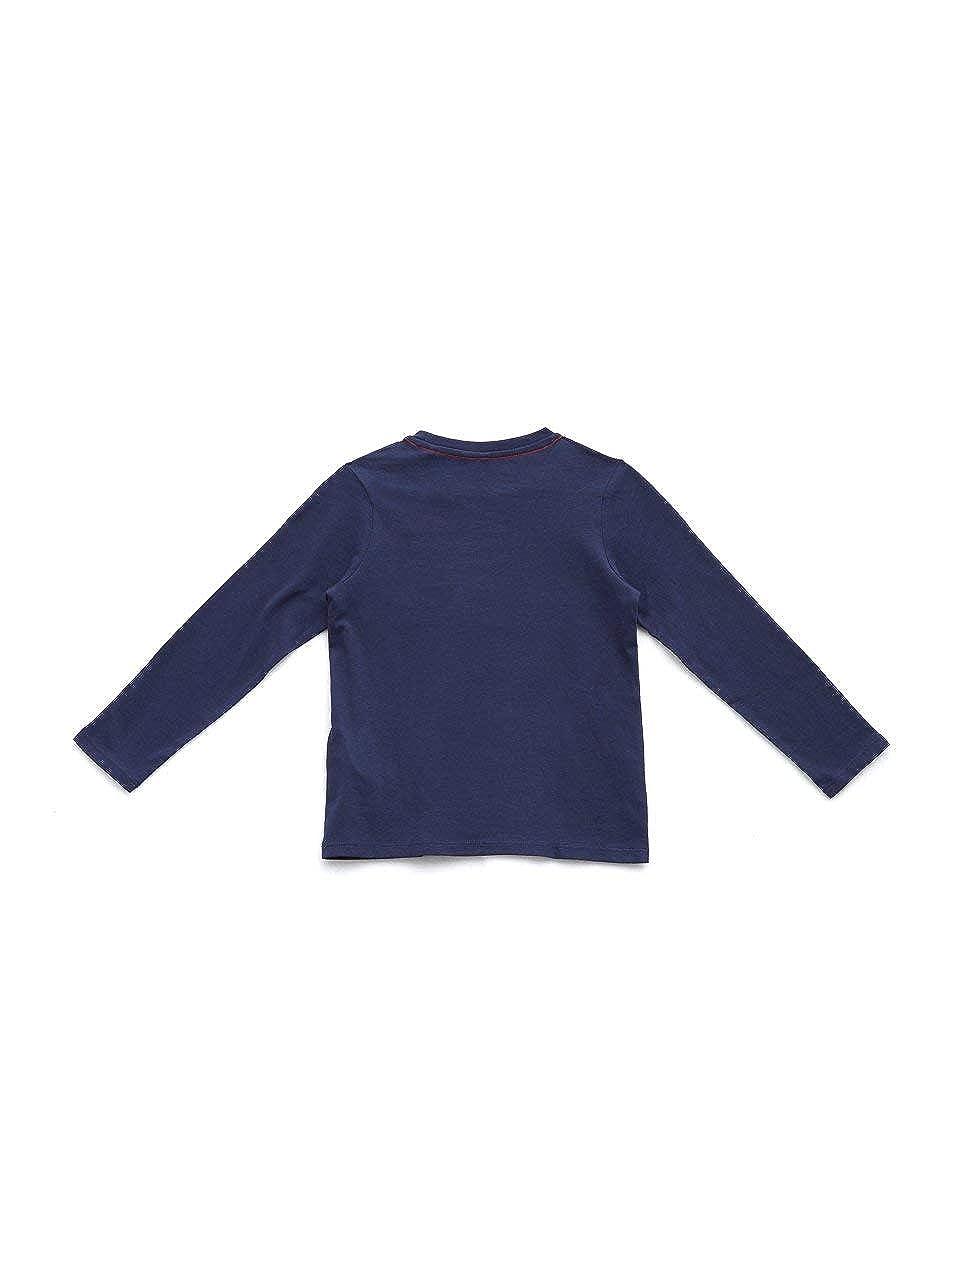 Guess T-Shirt Bimbo Art N84I24K5M20 DEKB Colore Foto Misura A Scelta